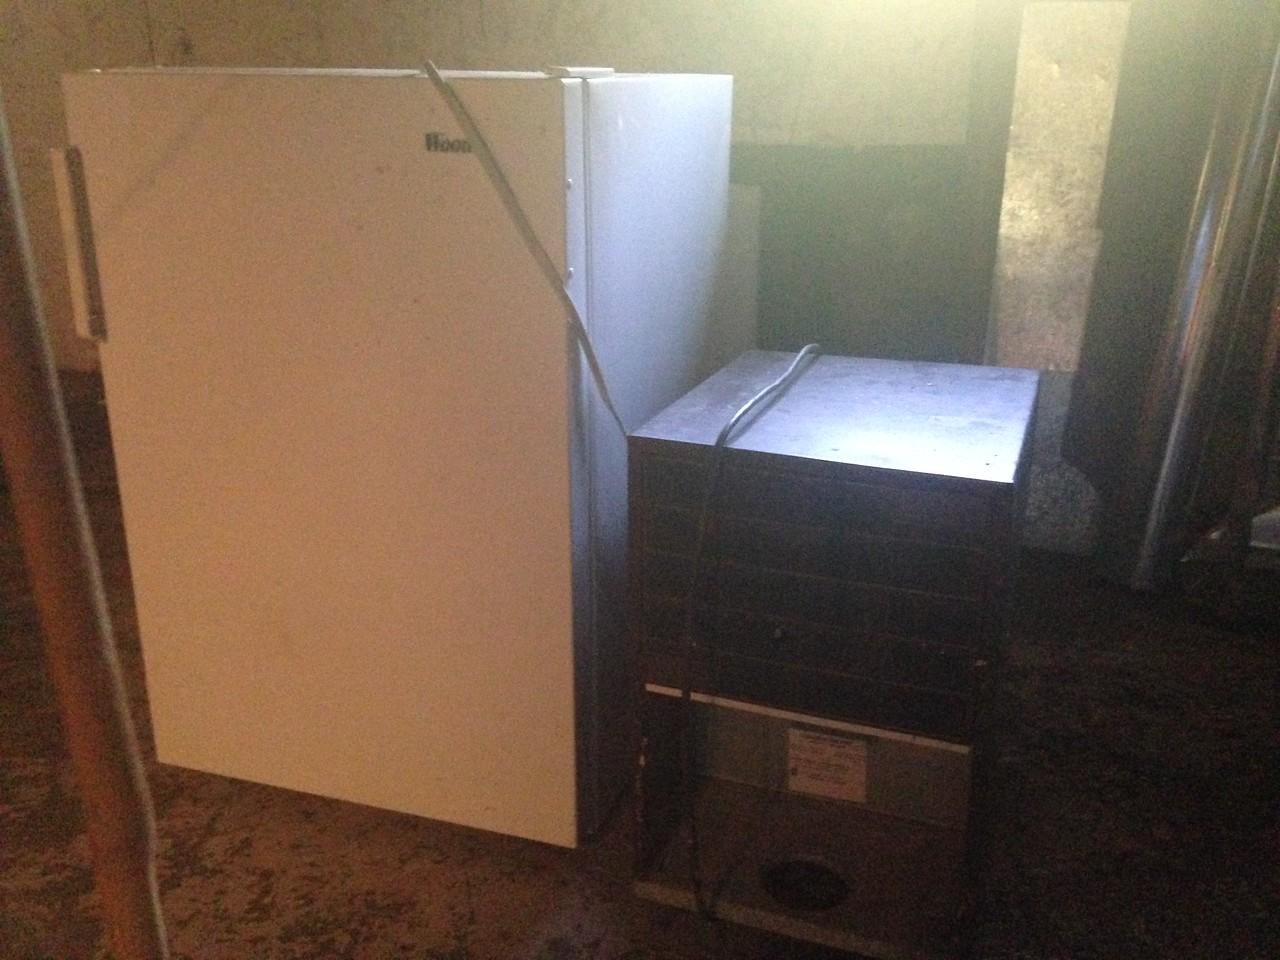 May 16 freezer and dehumidifier